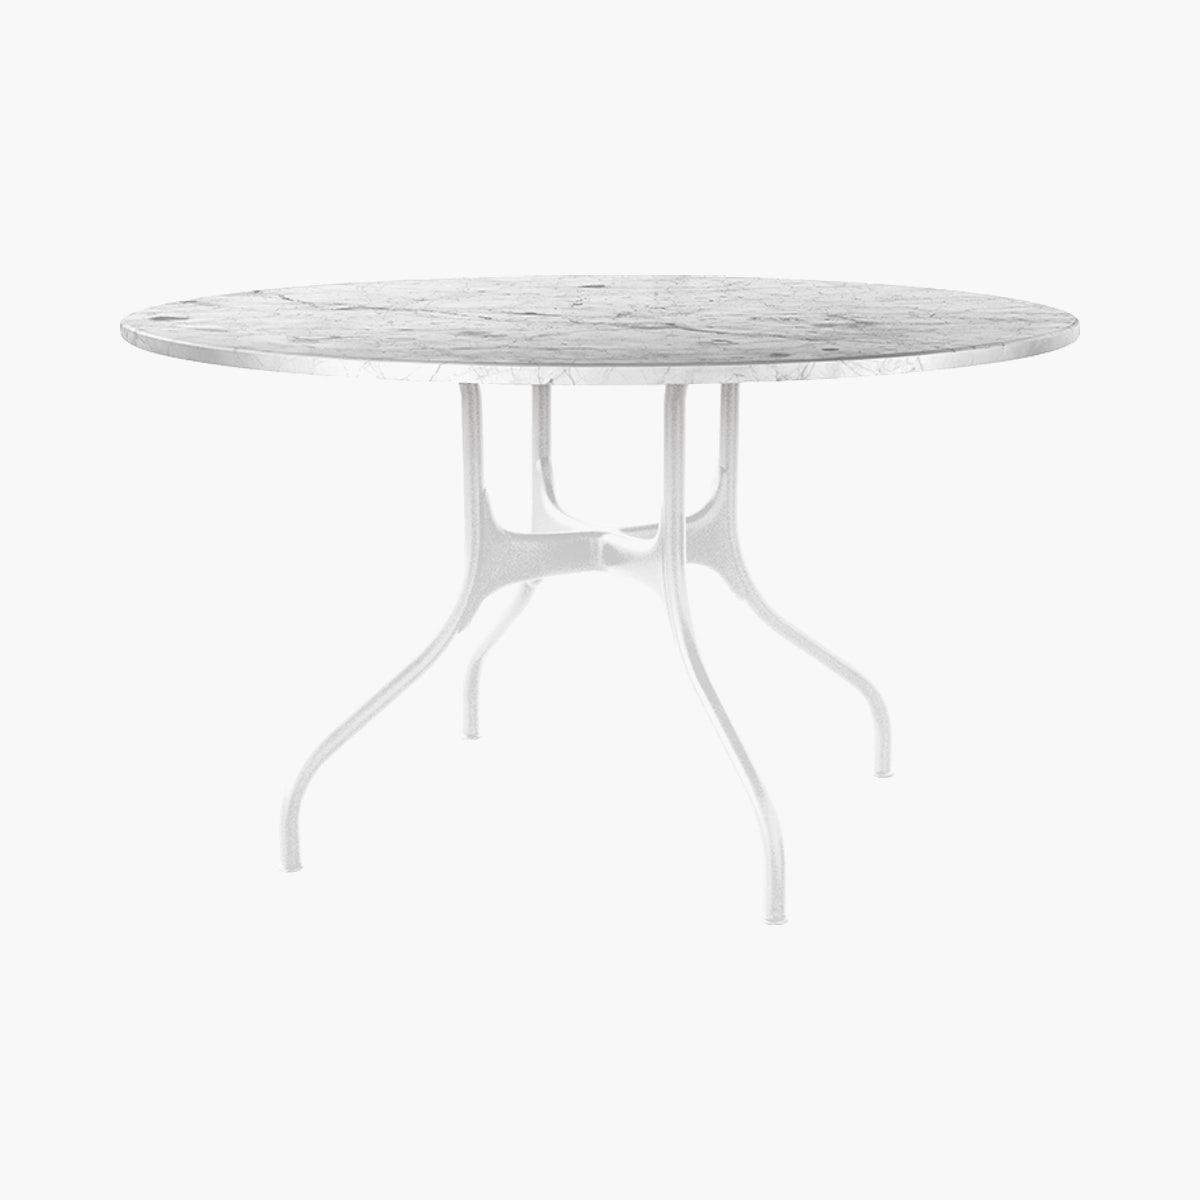 Milà Table, Round